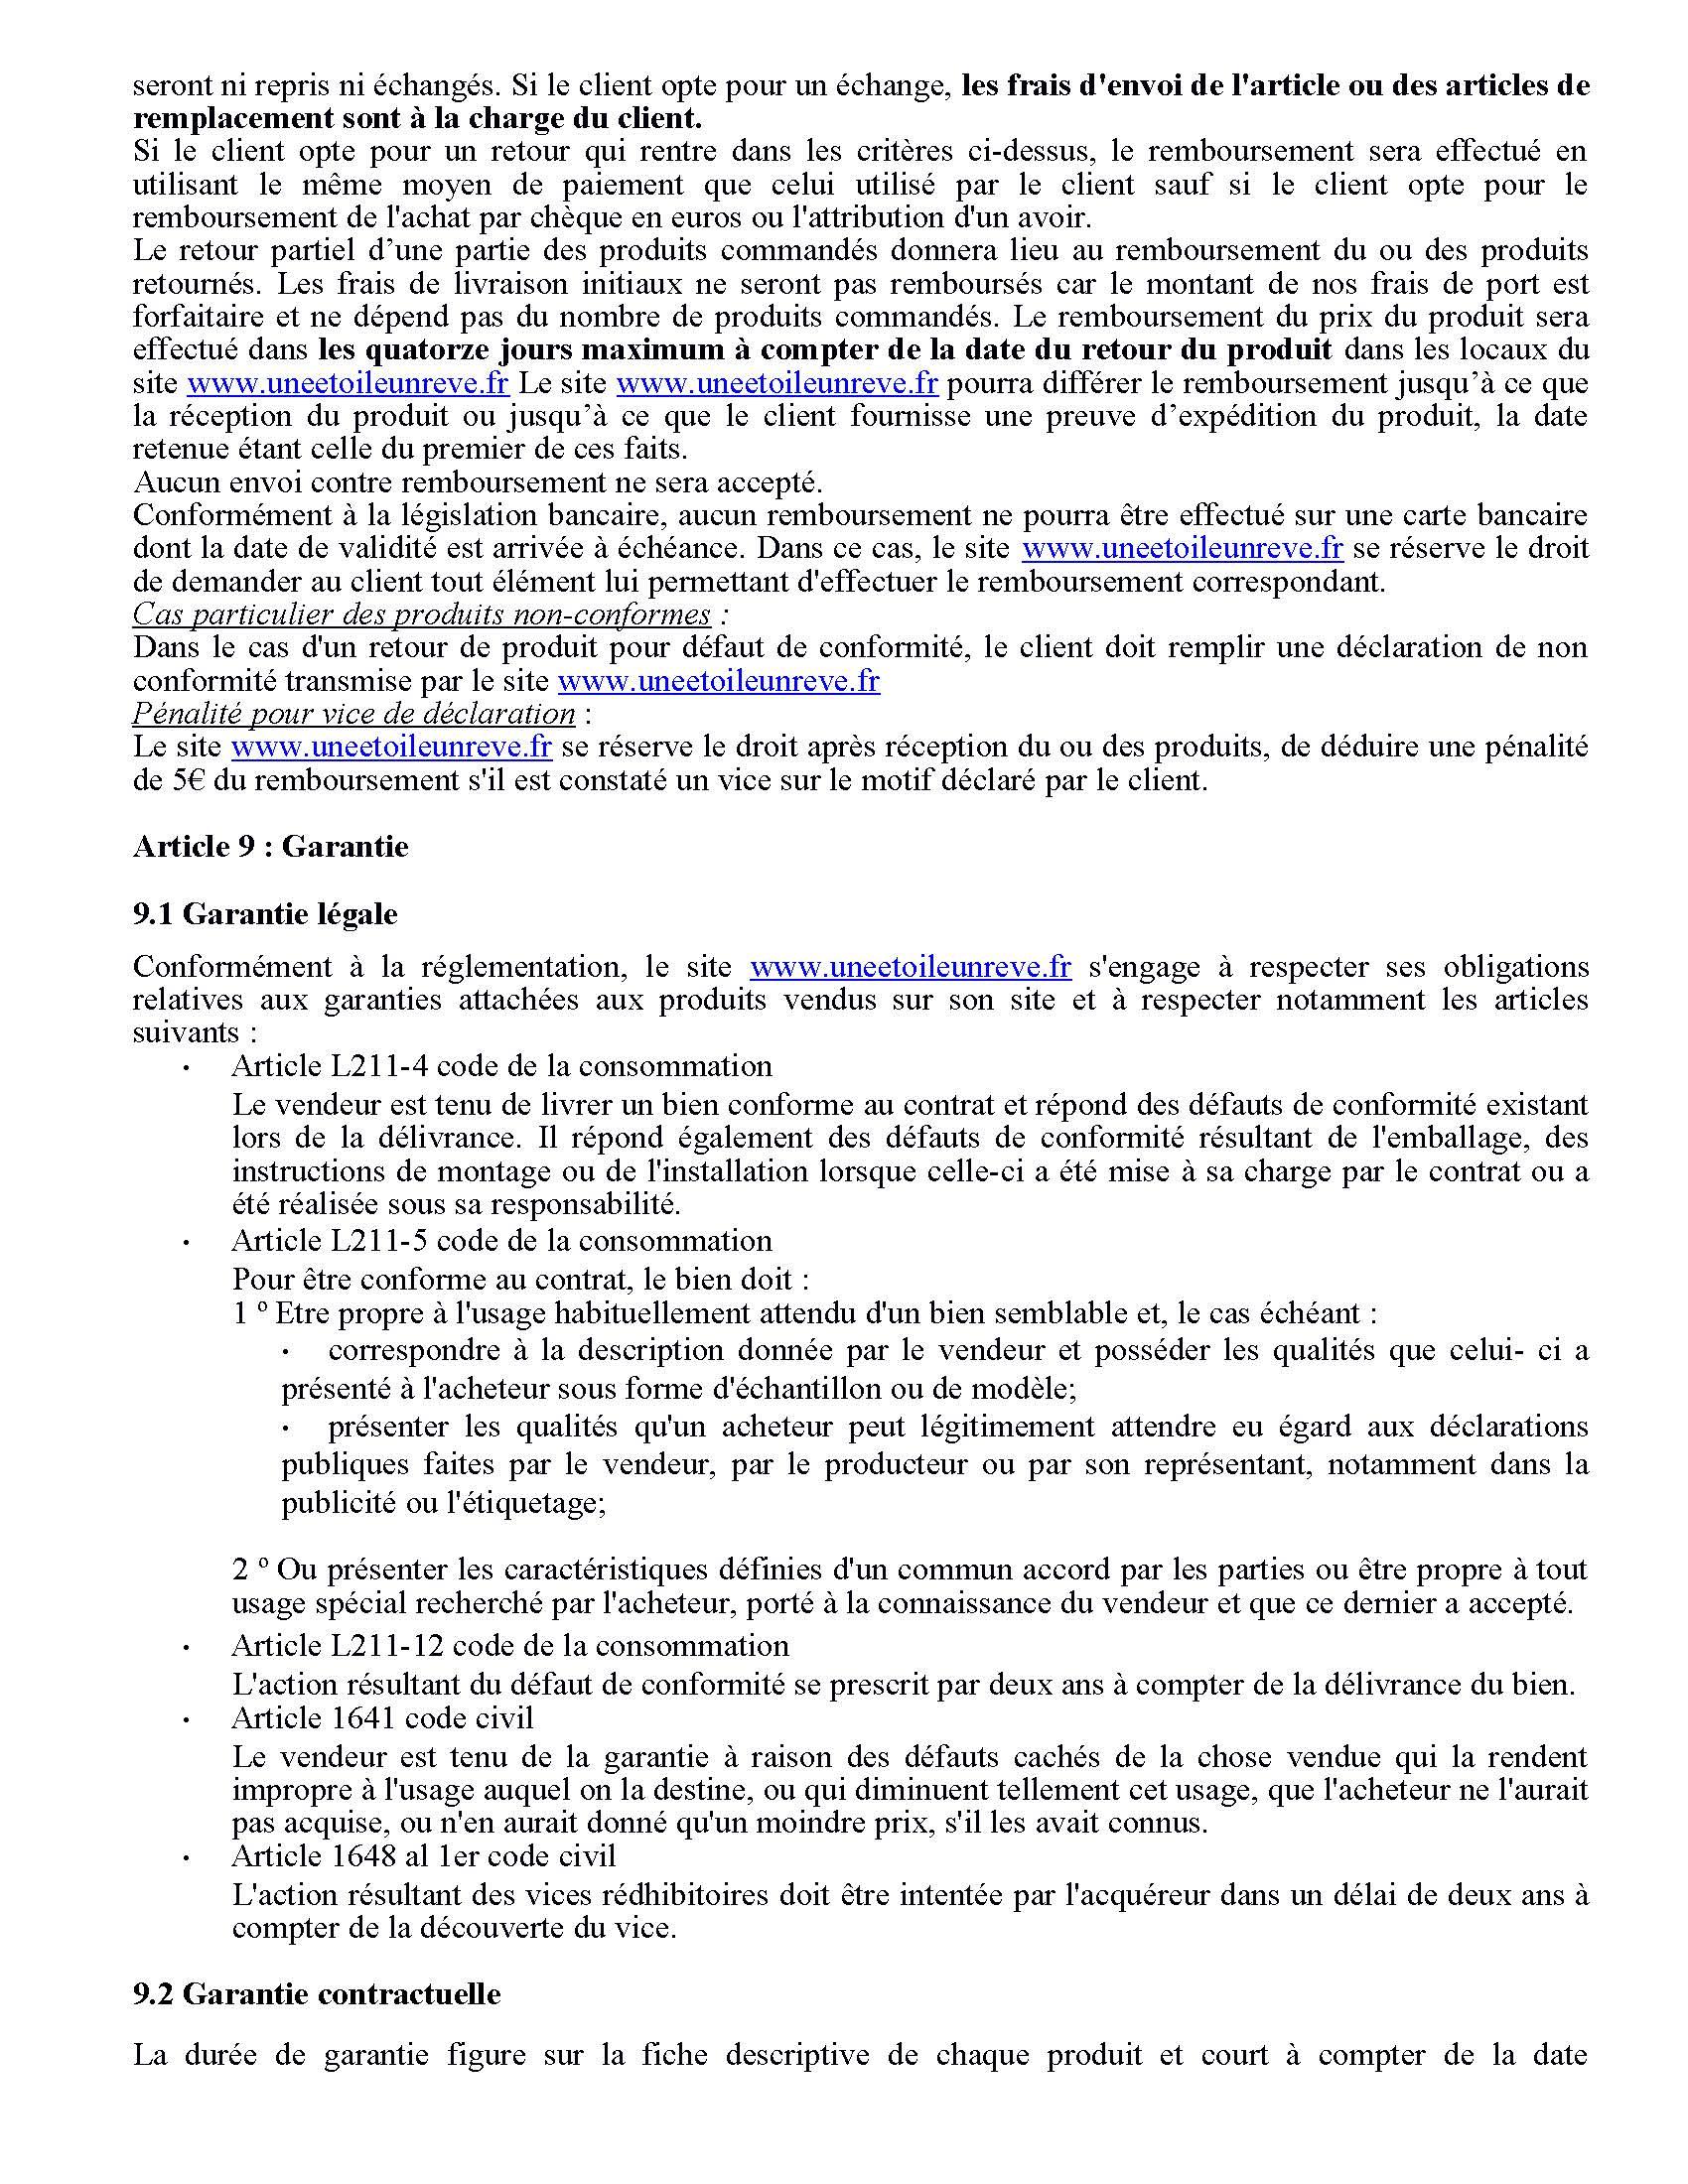 CGV_www.uneetoileunreve.fr_Page_10.jpg